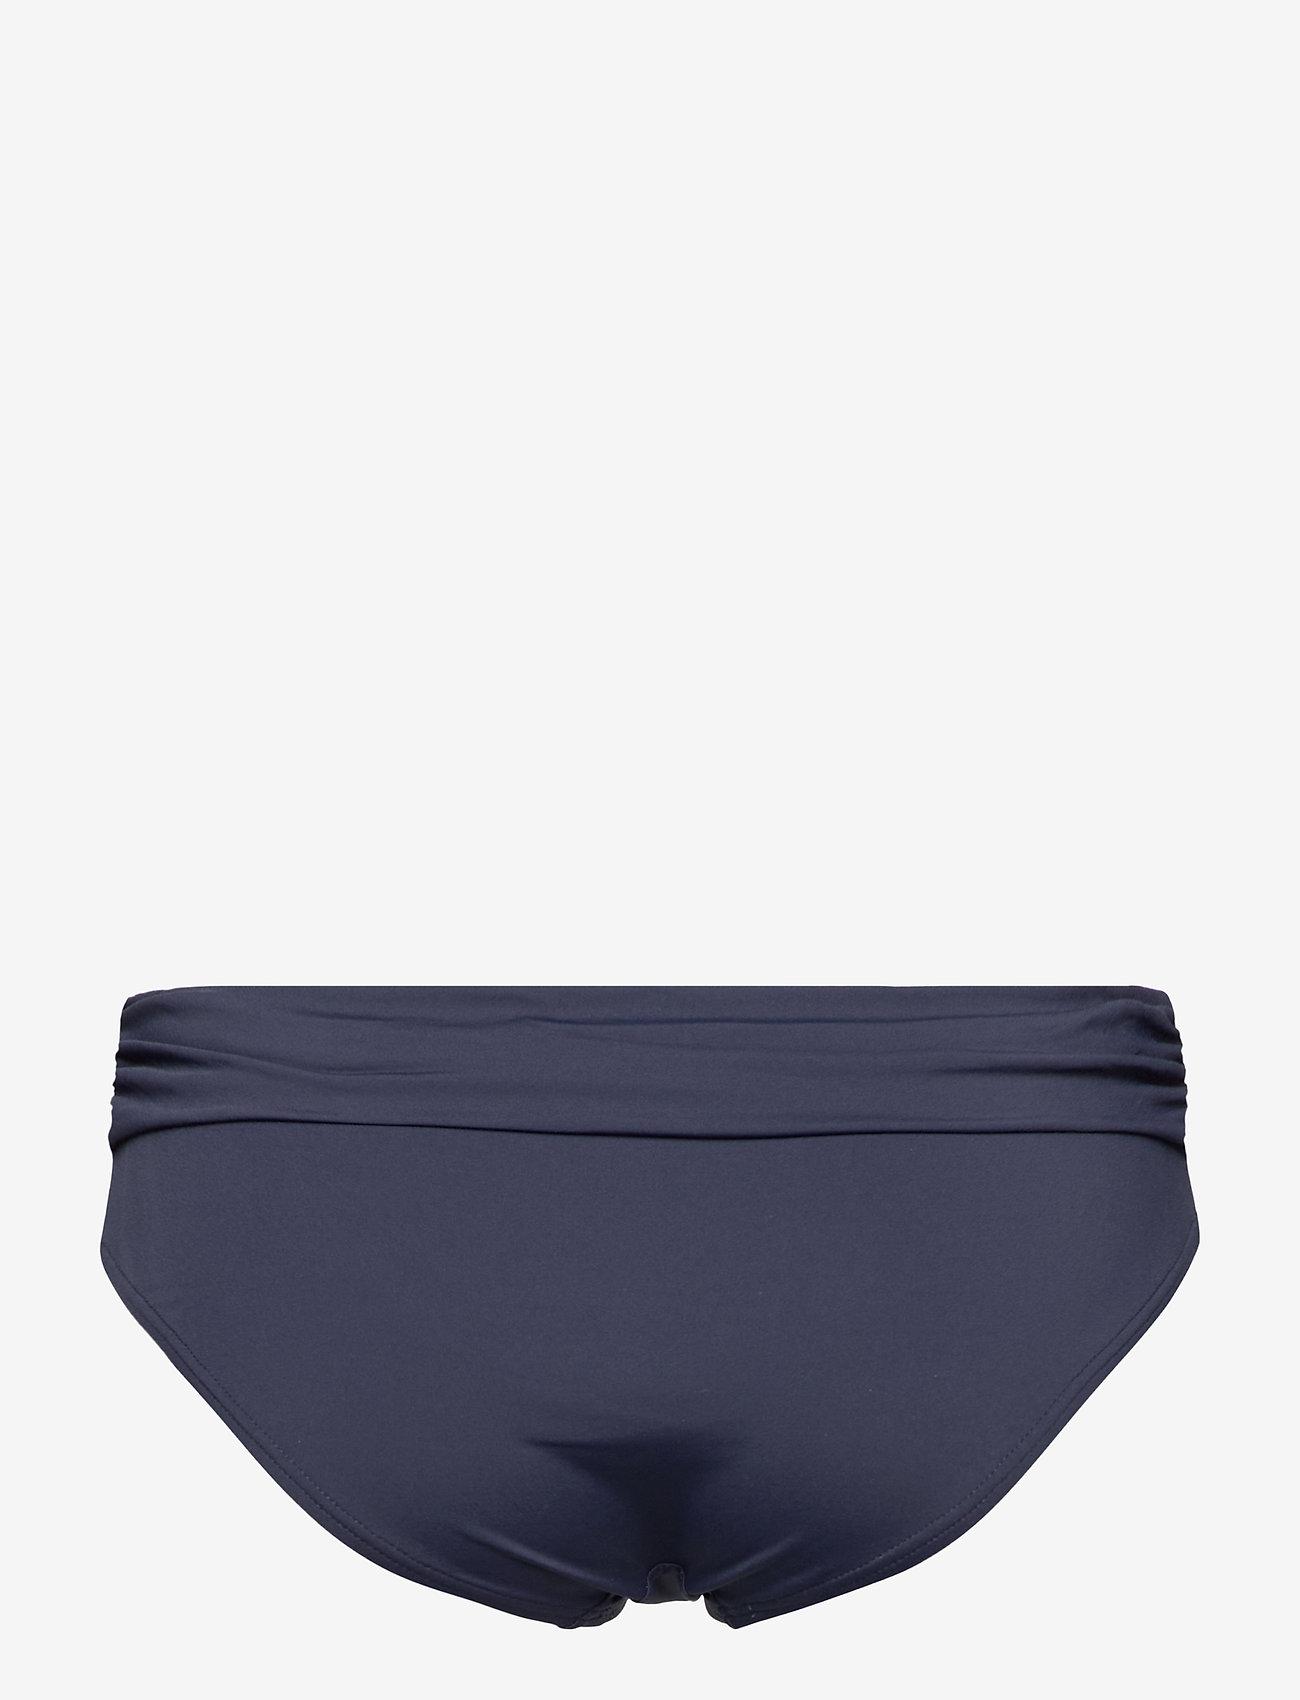 Michael Kors Swimwear - BIKINI BTM - bikinibroekjes - new navy - 1